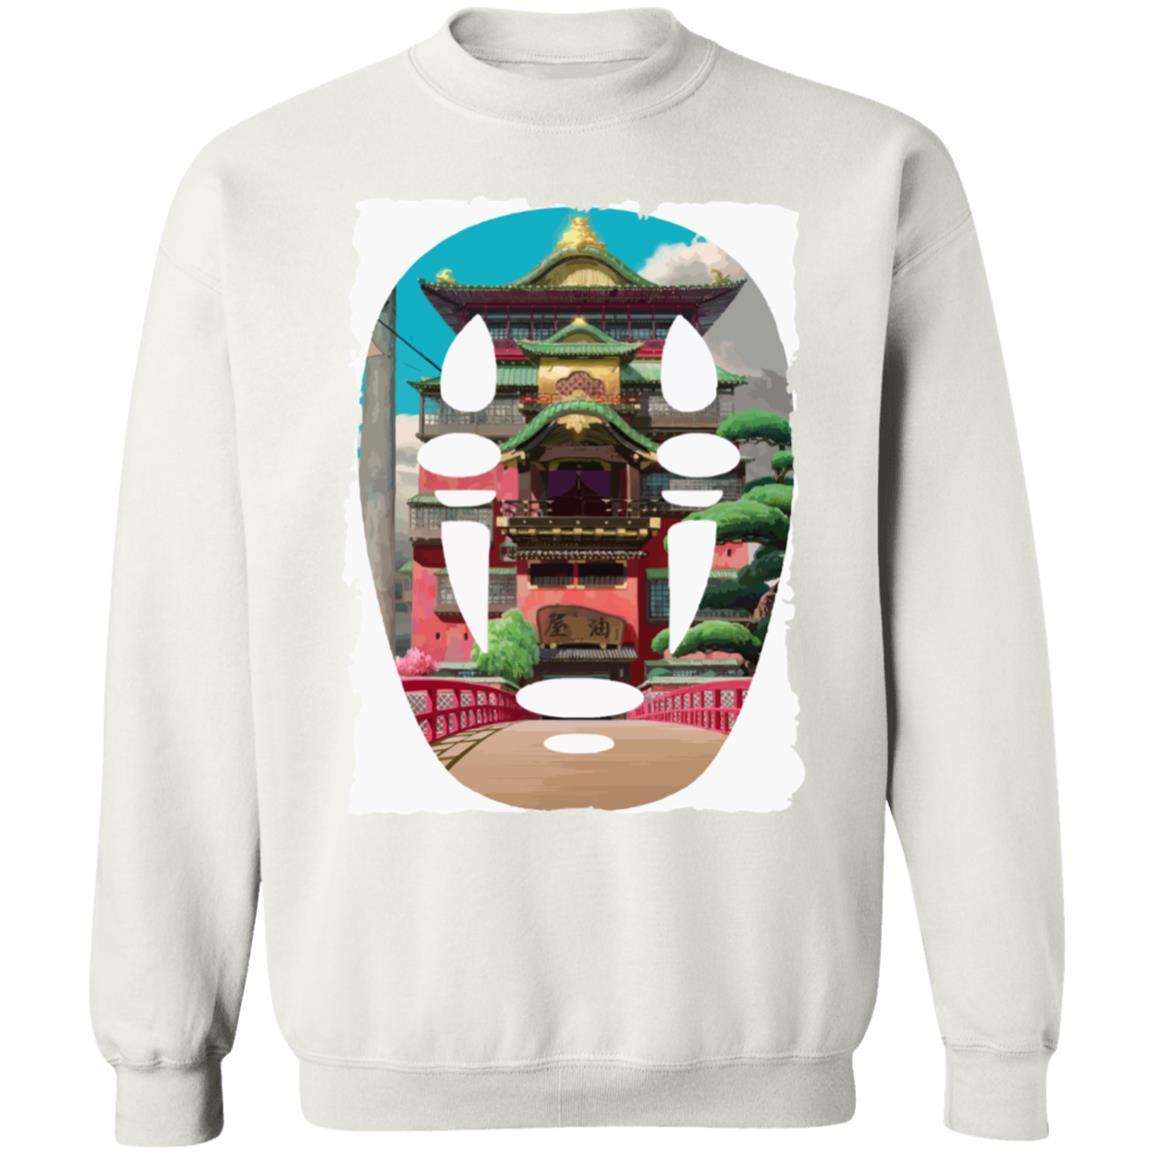 Spirited Away –  The Bathhouse Ft. No Face Sweatshirt